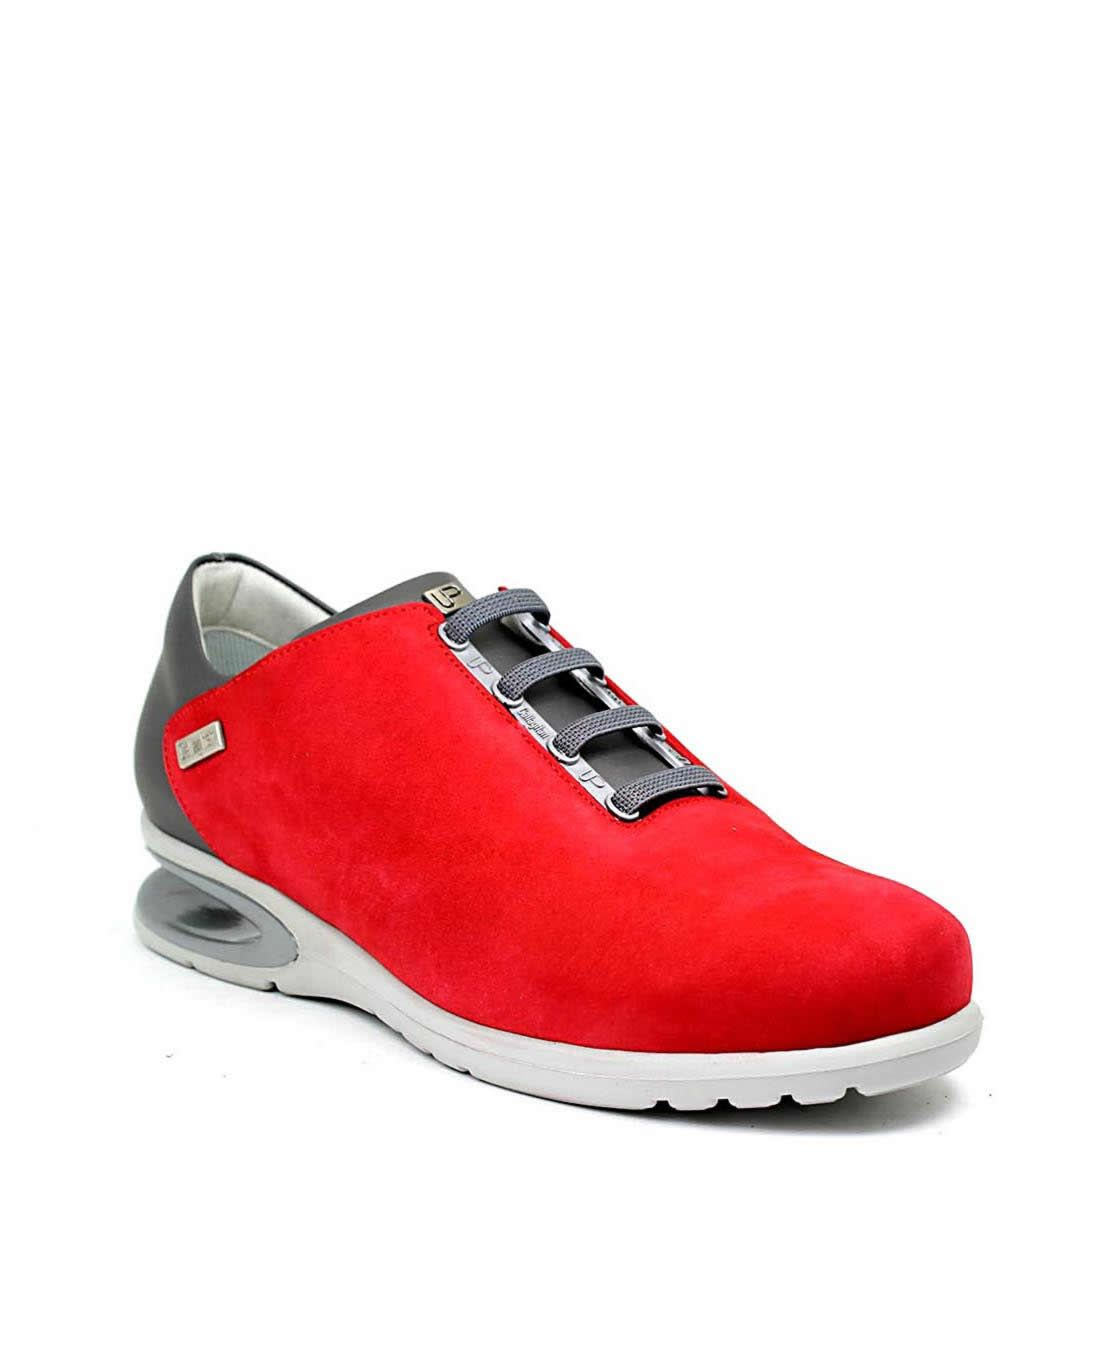 Zapatillas Callaghan Rojo 86700 Sneakers Shoes Fashion